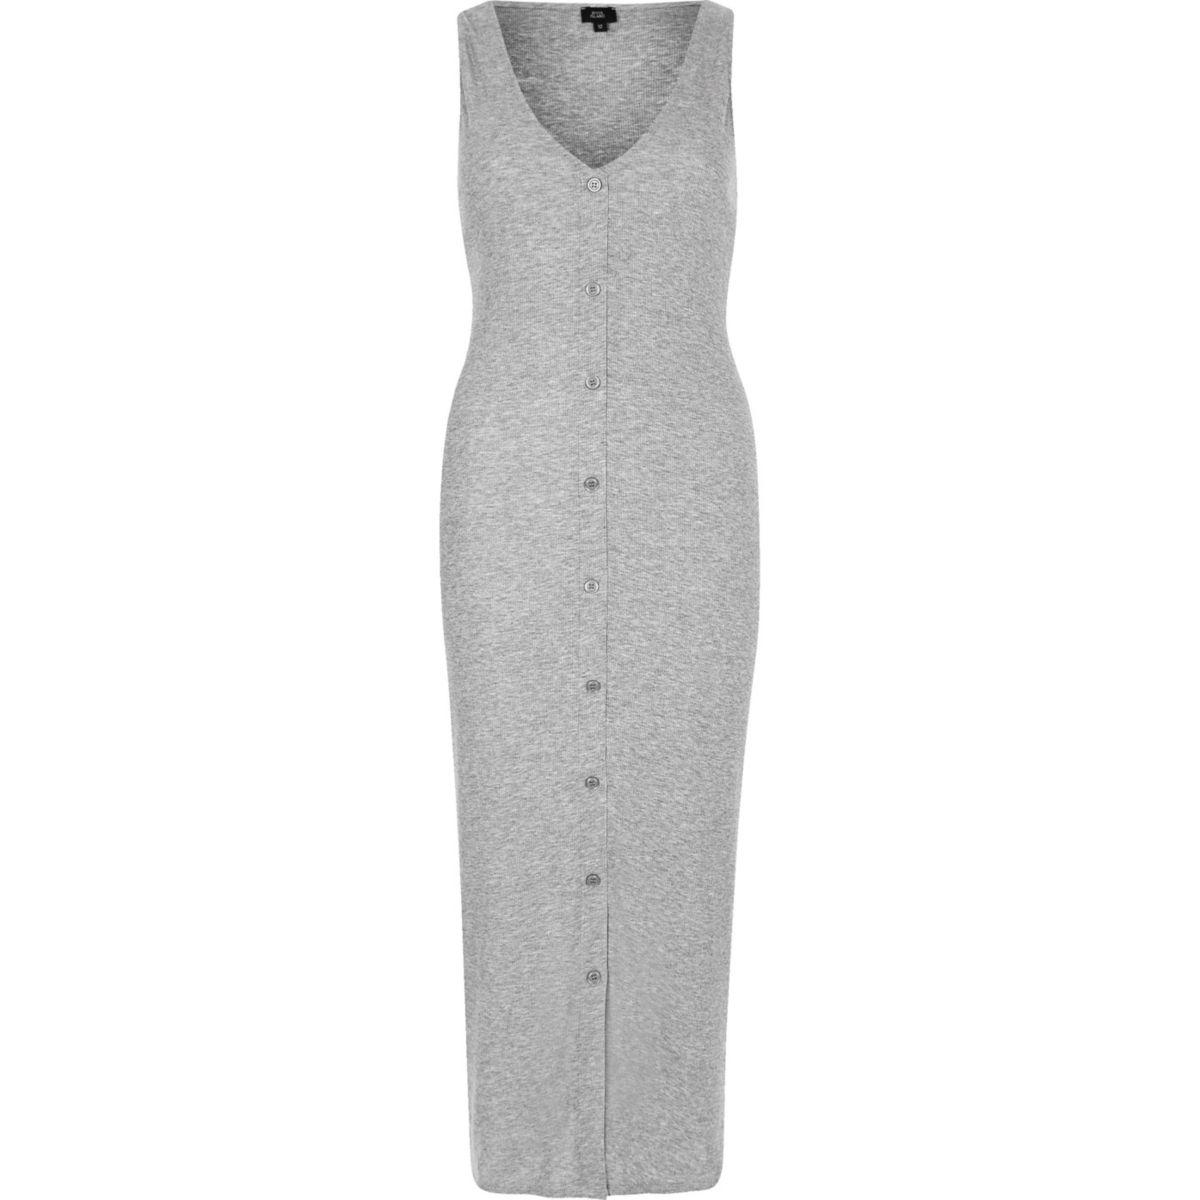 Grey sleeveless ribbed button-up maxi dress